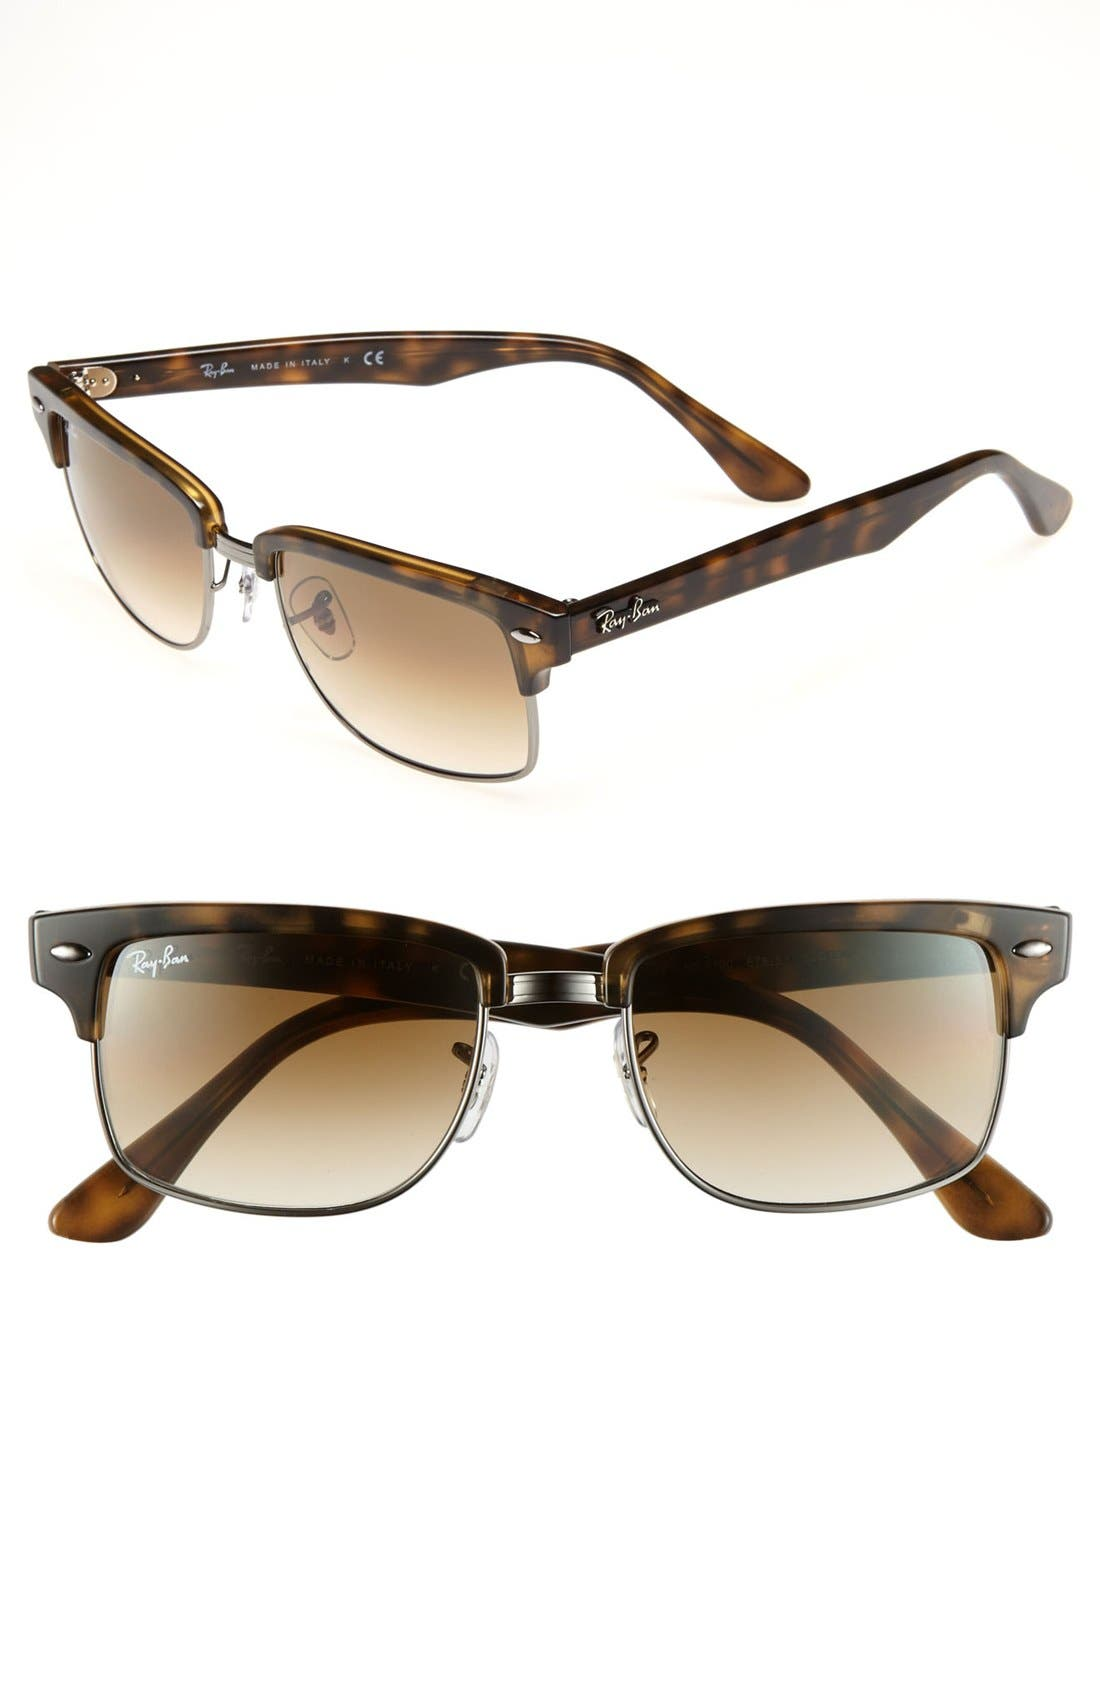 Main Image - Ray-Ban 'Clubmaster' 52mm Sunglasses